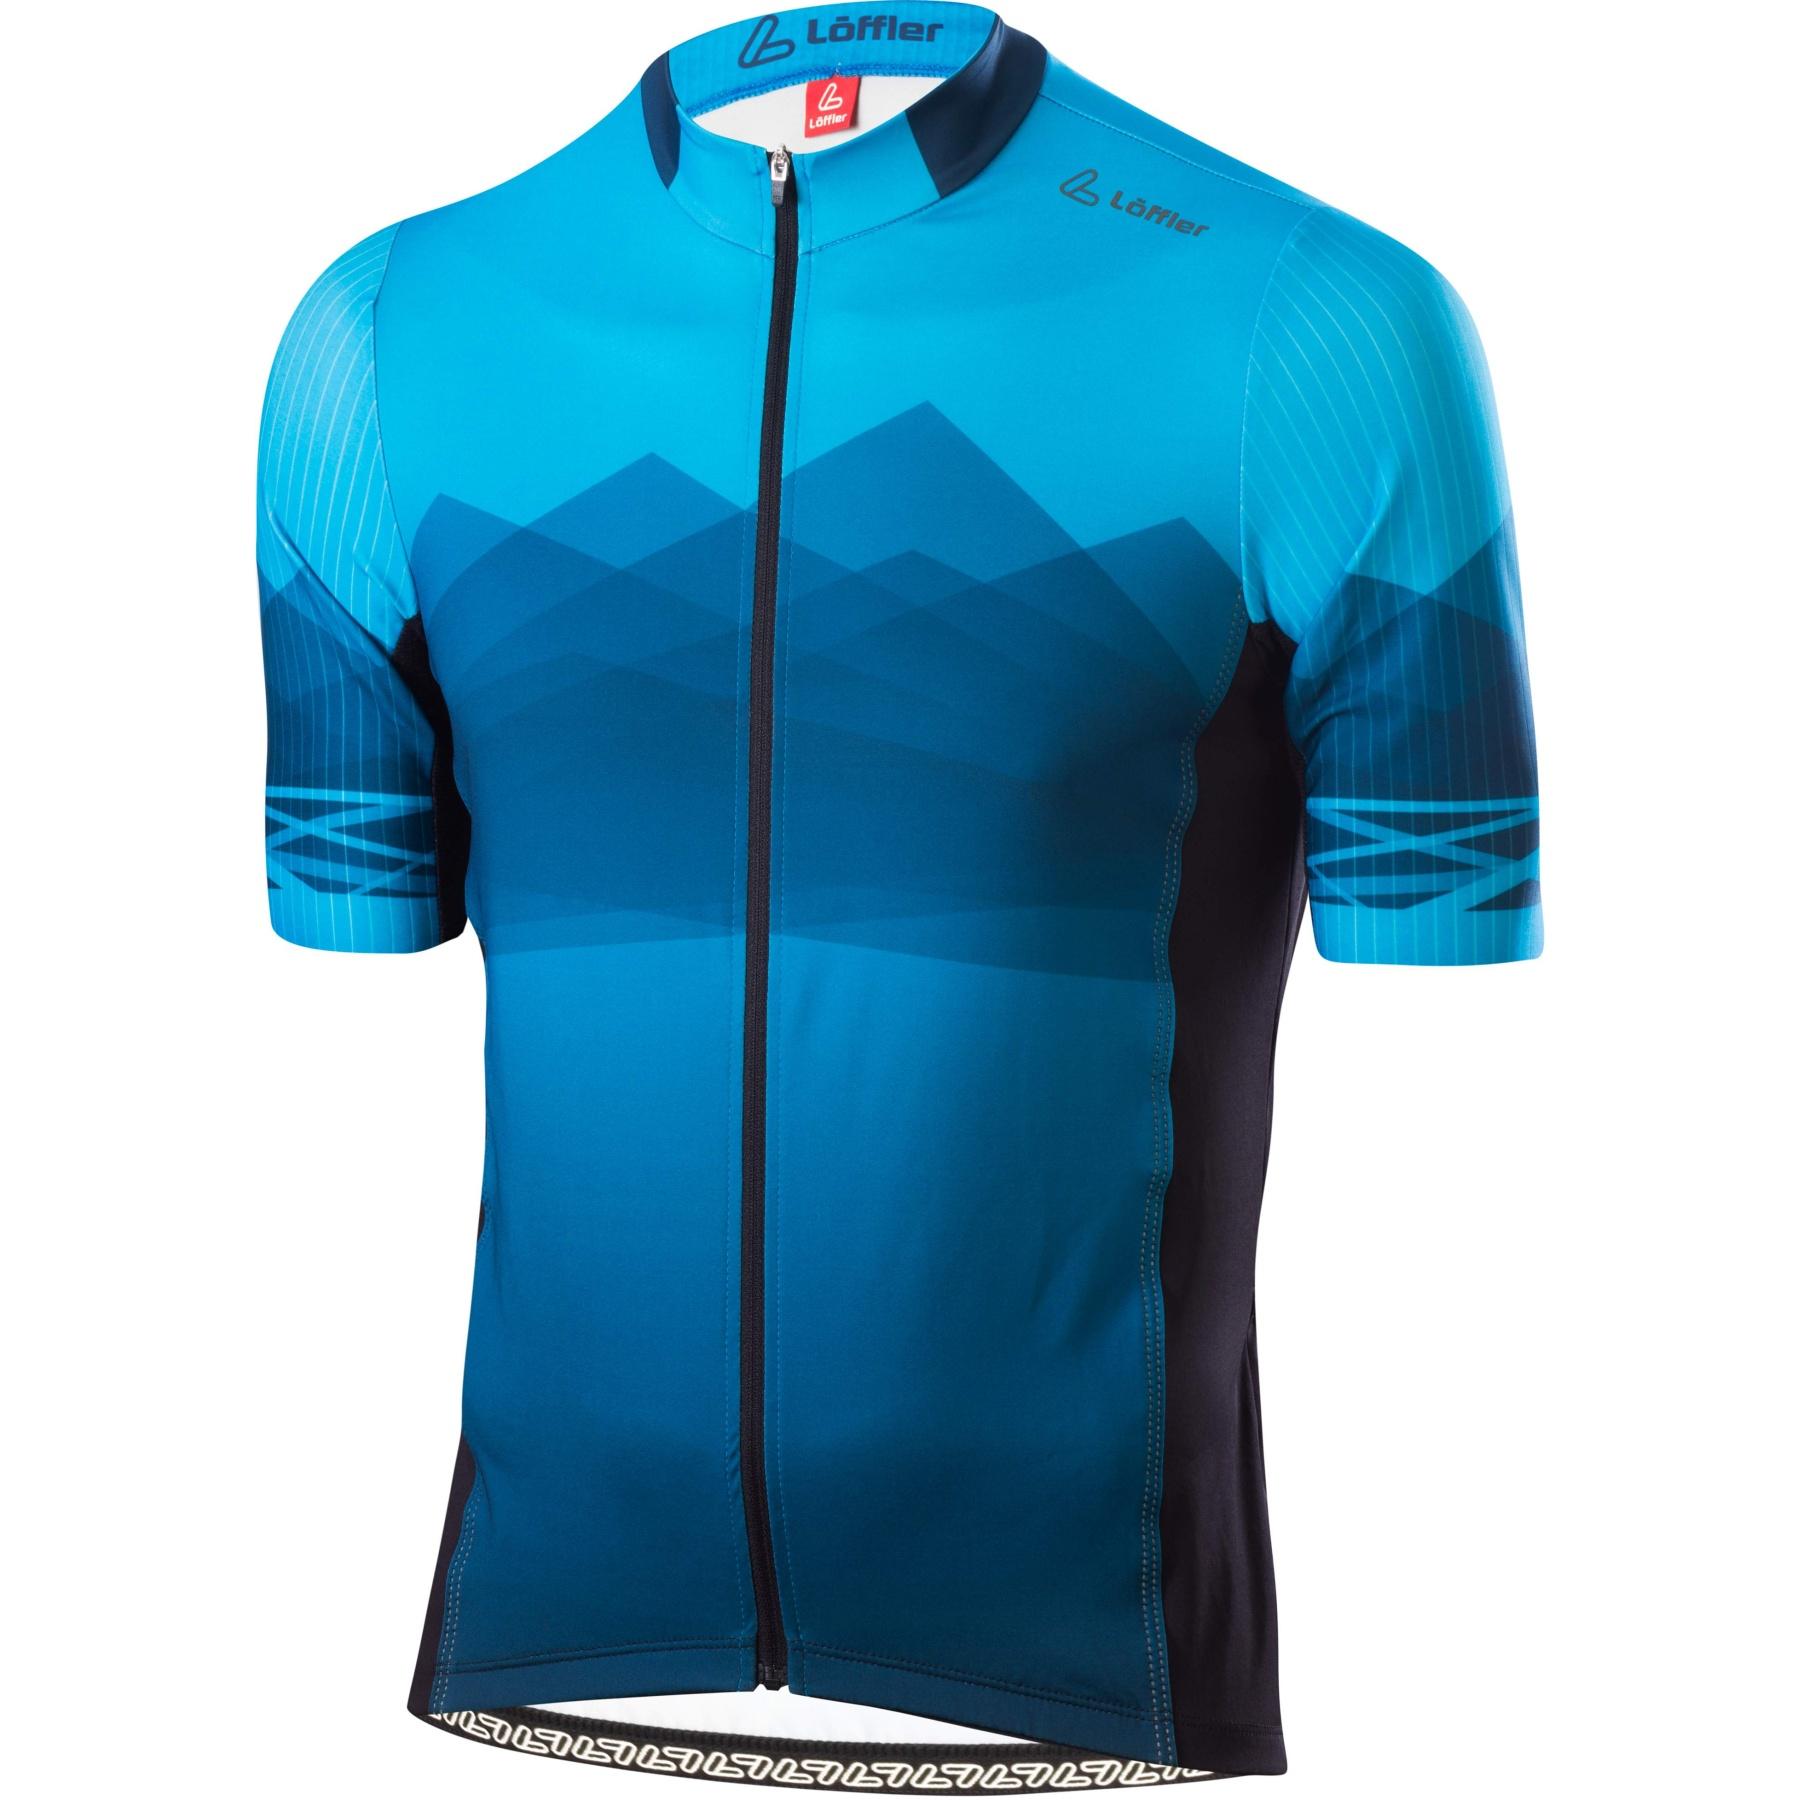 Löffler Bike Trikot FZ Hotbond RF 24597 - blue lake 426